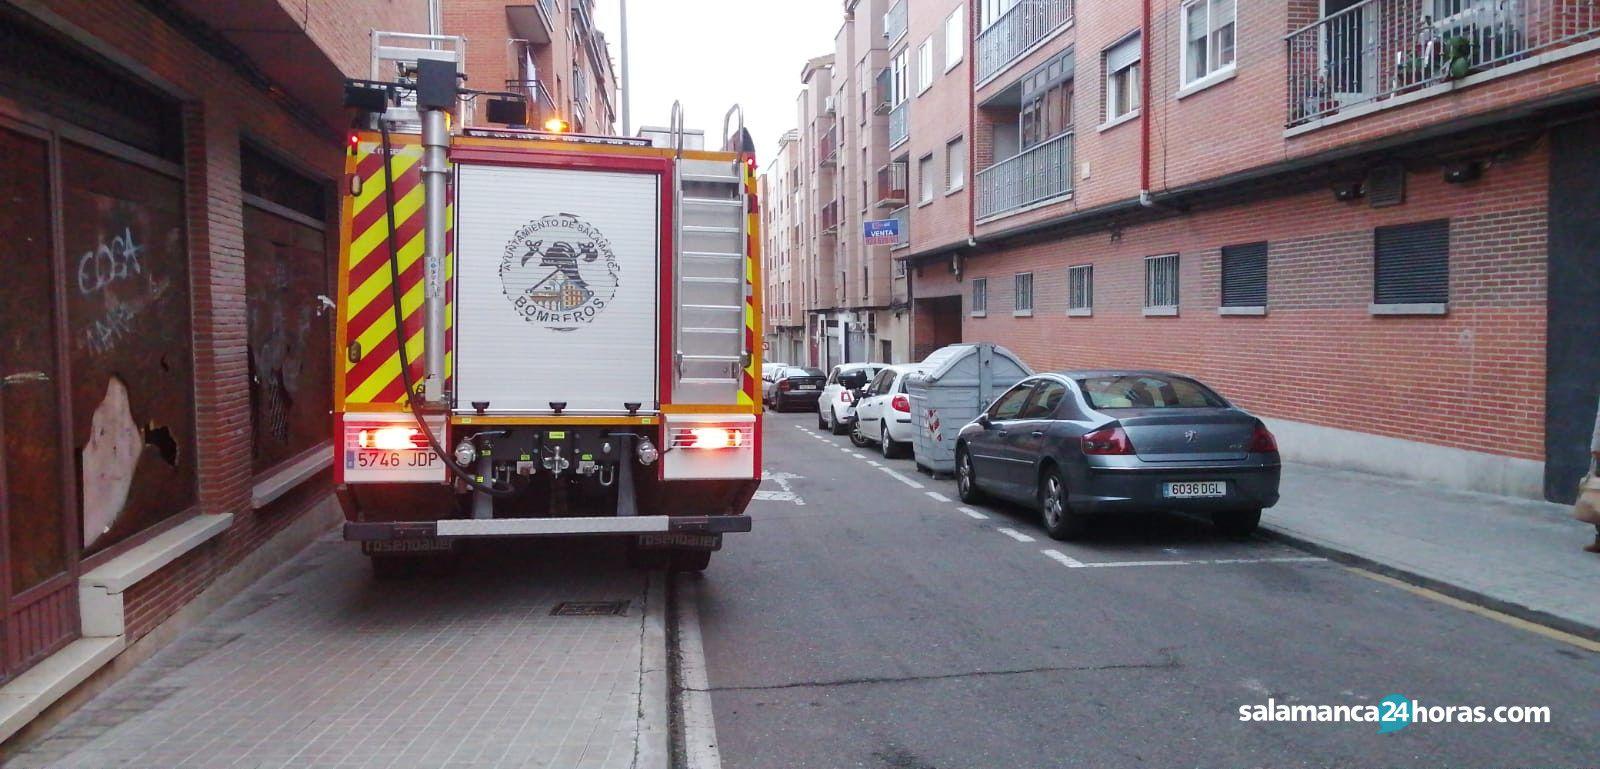 Bomberos calle almansa (2)